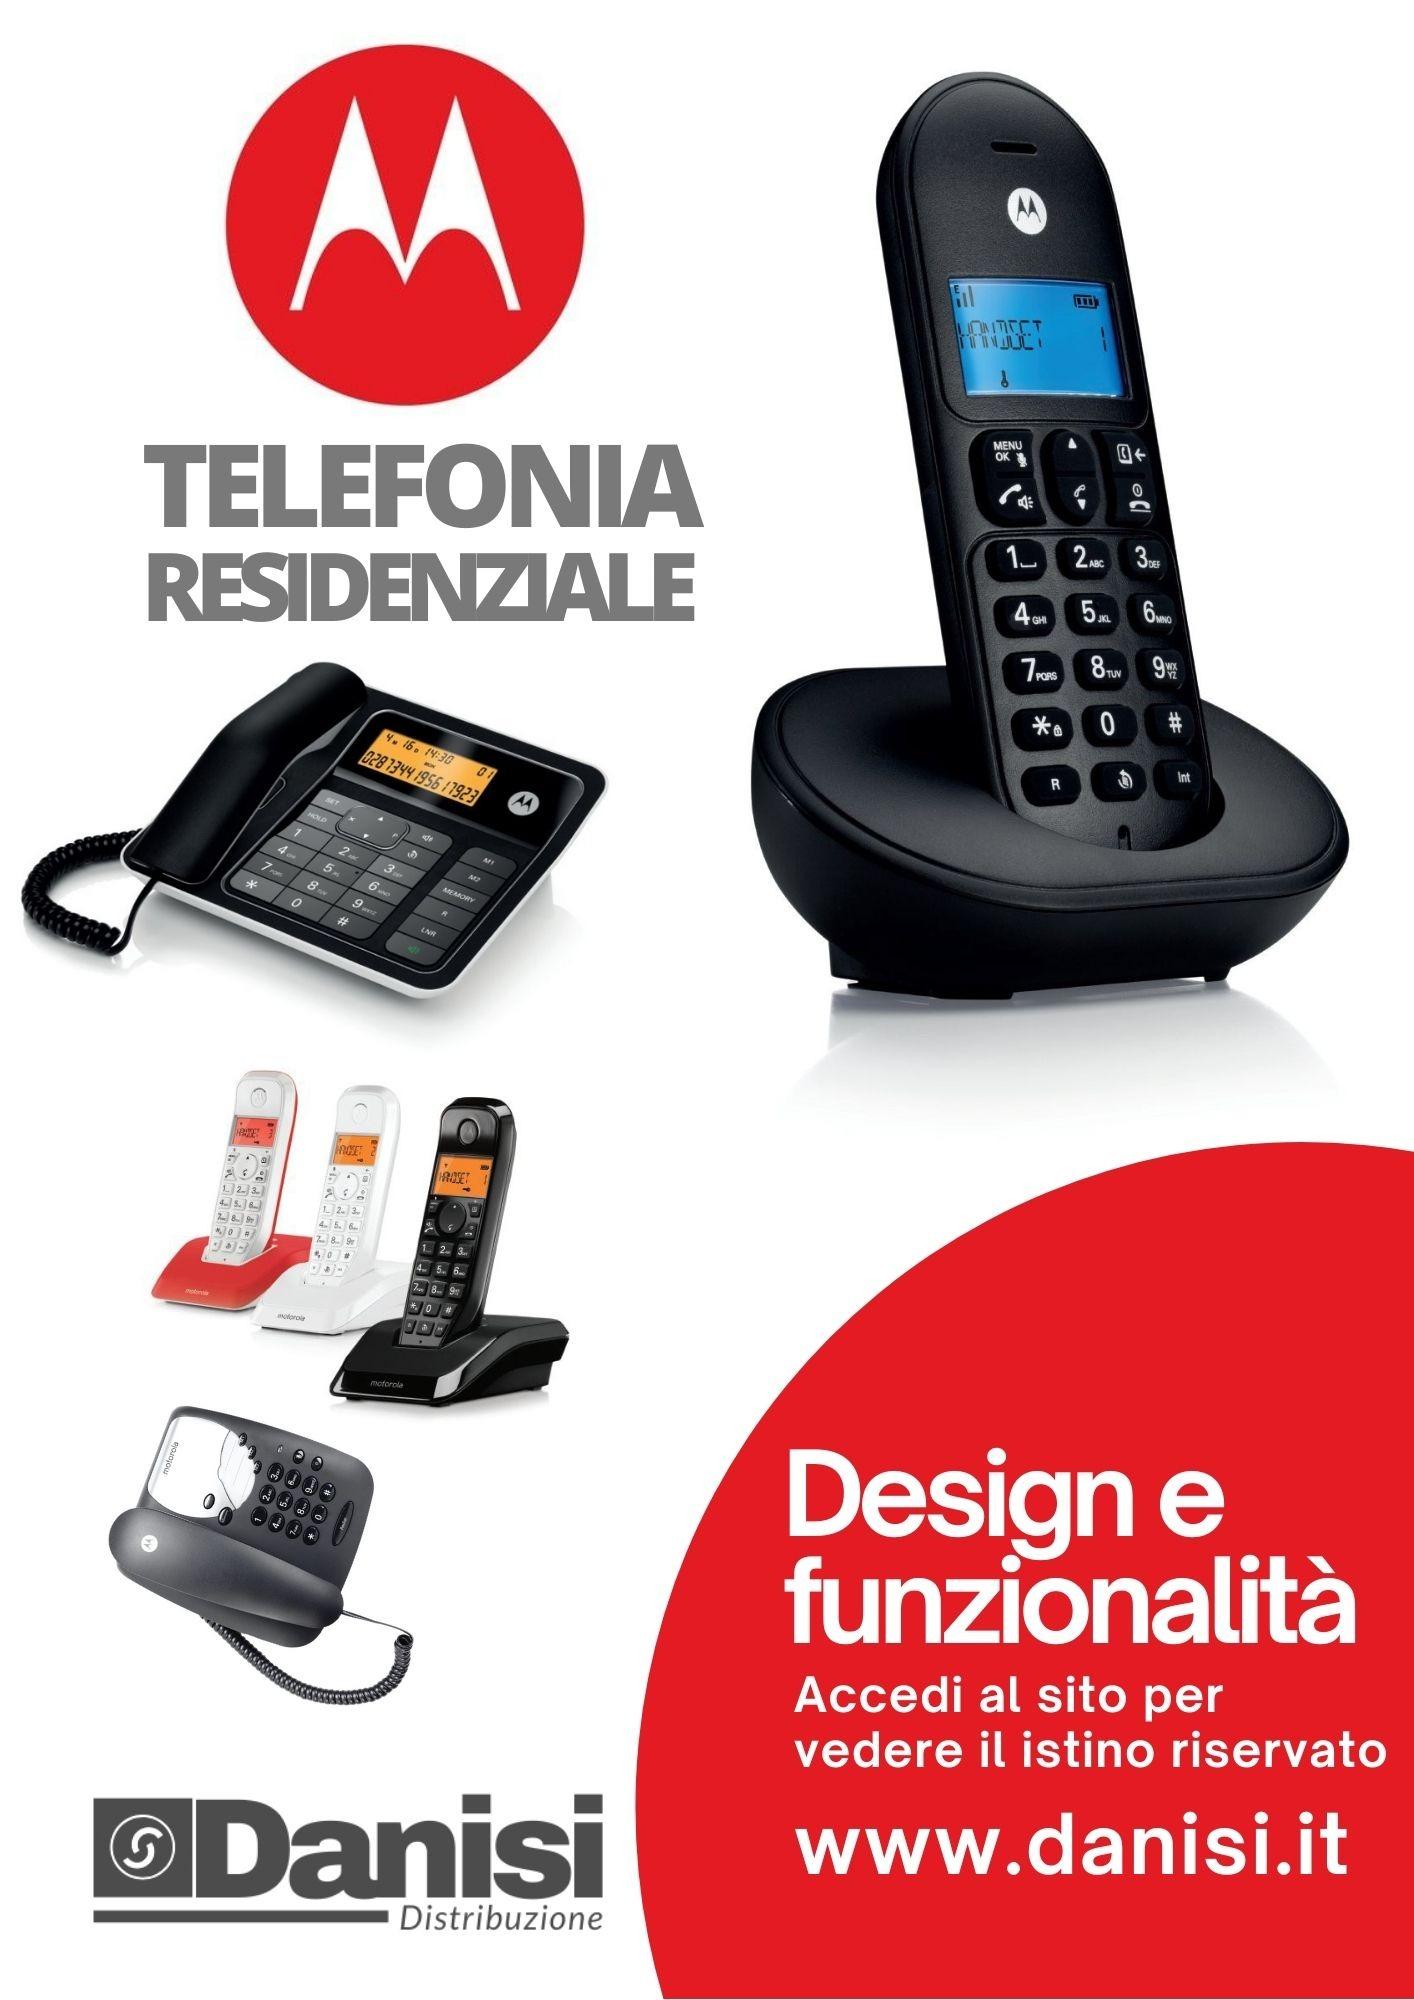 Motorola residenziale